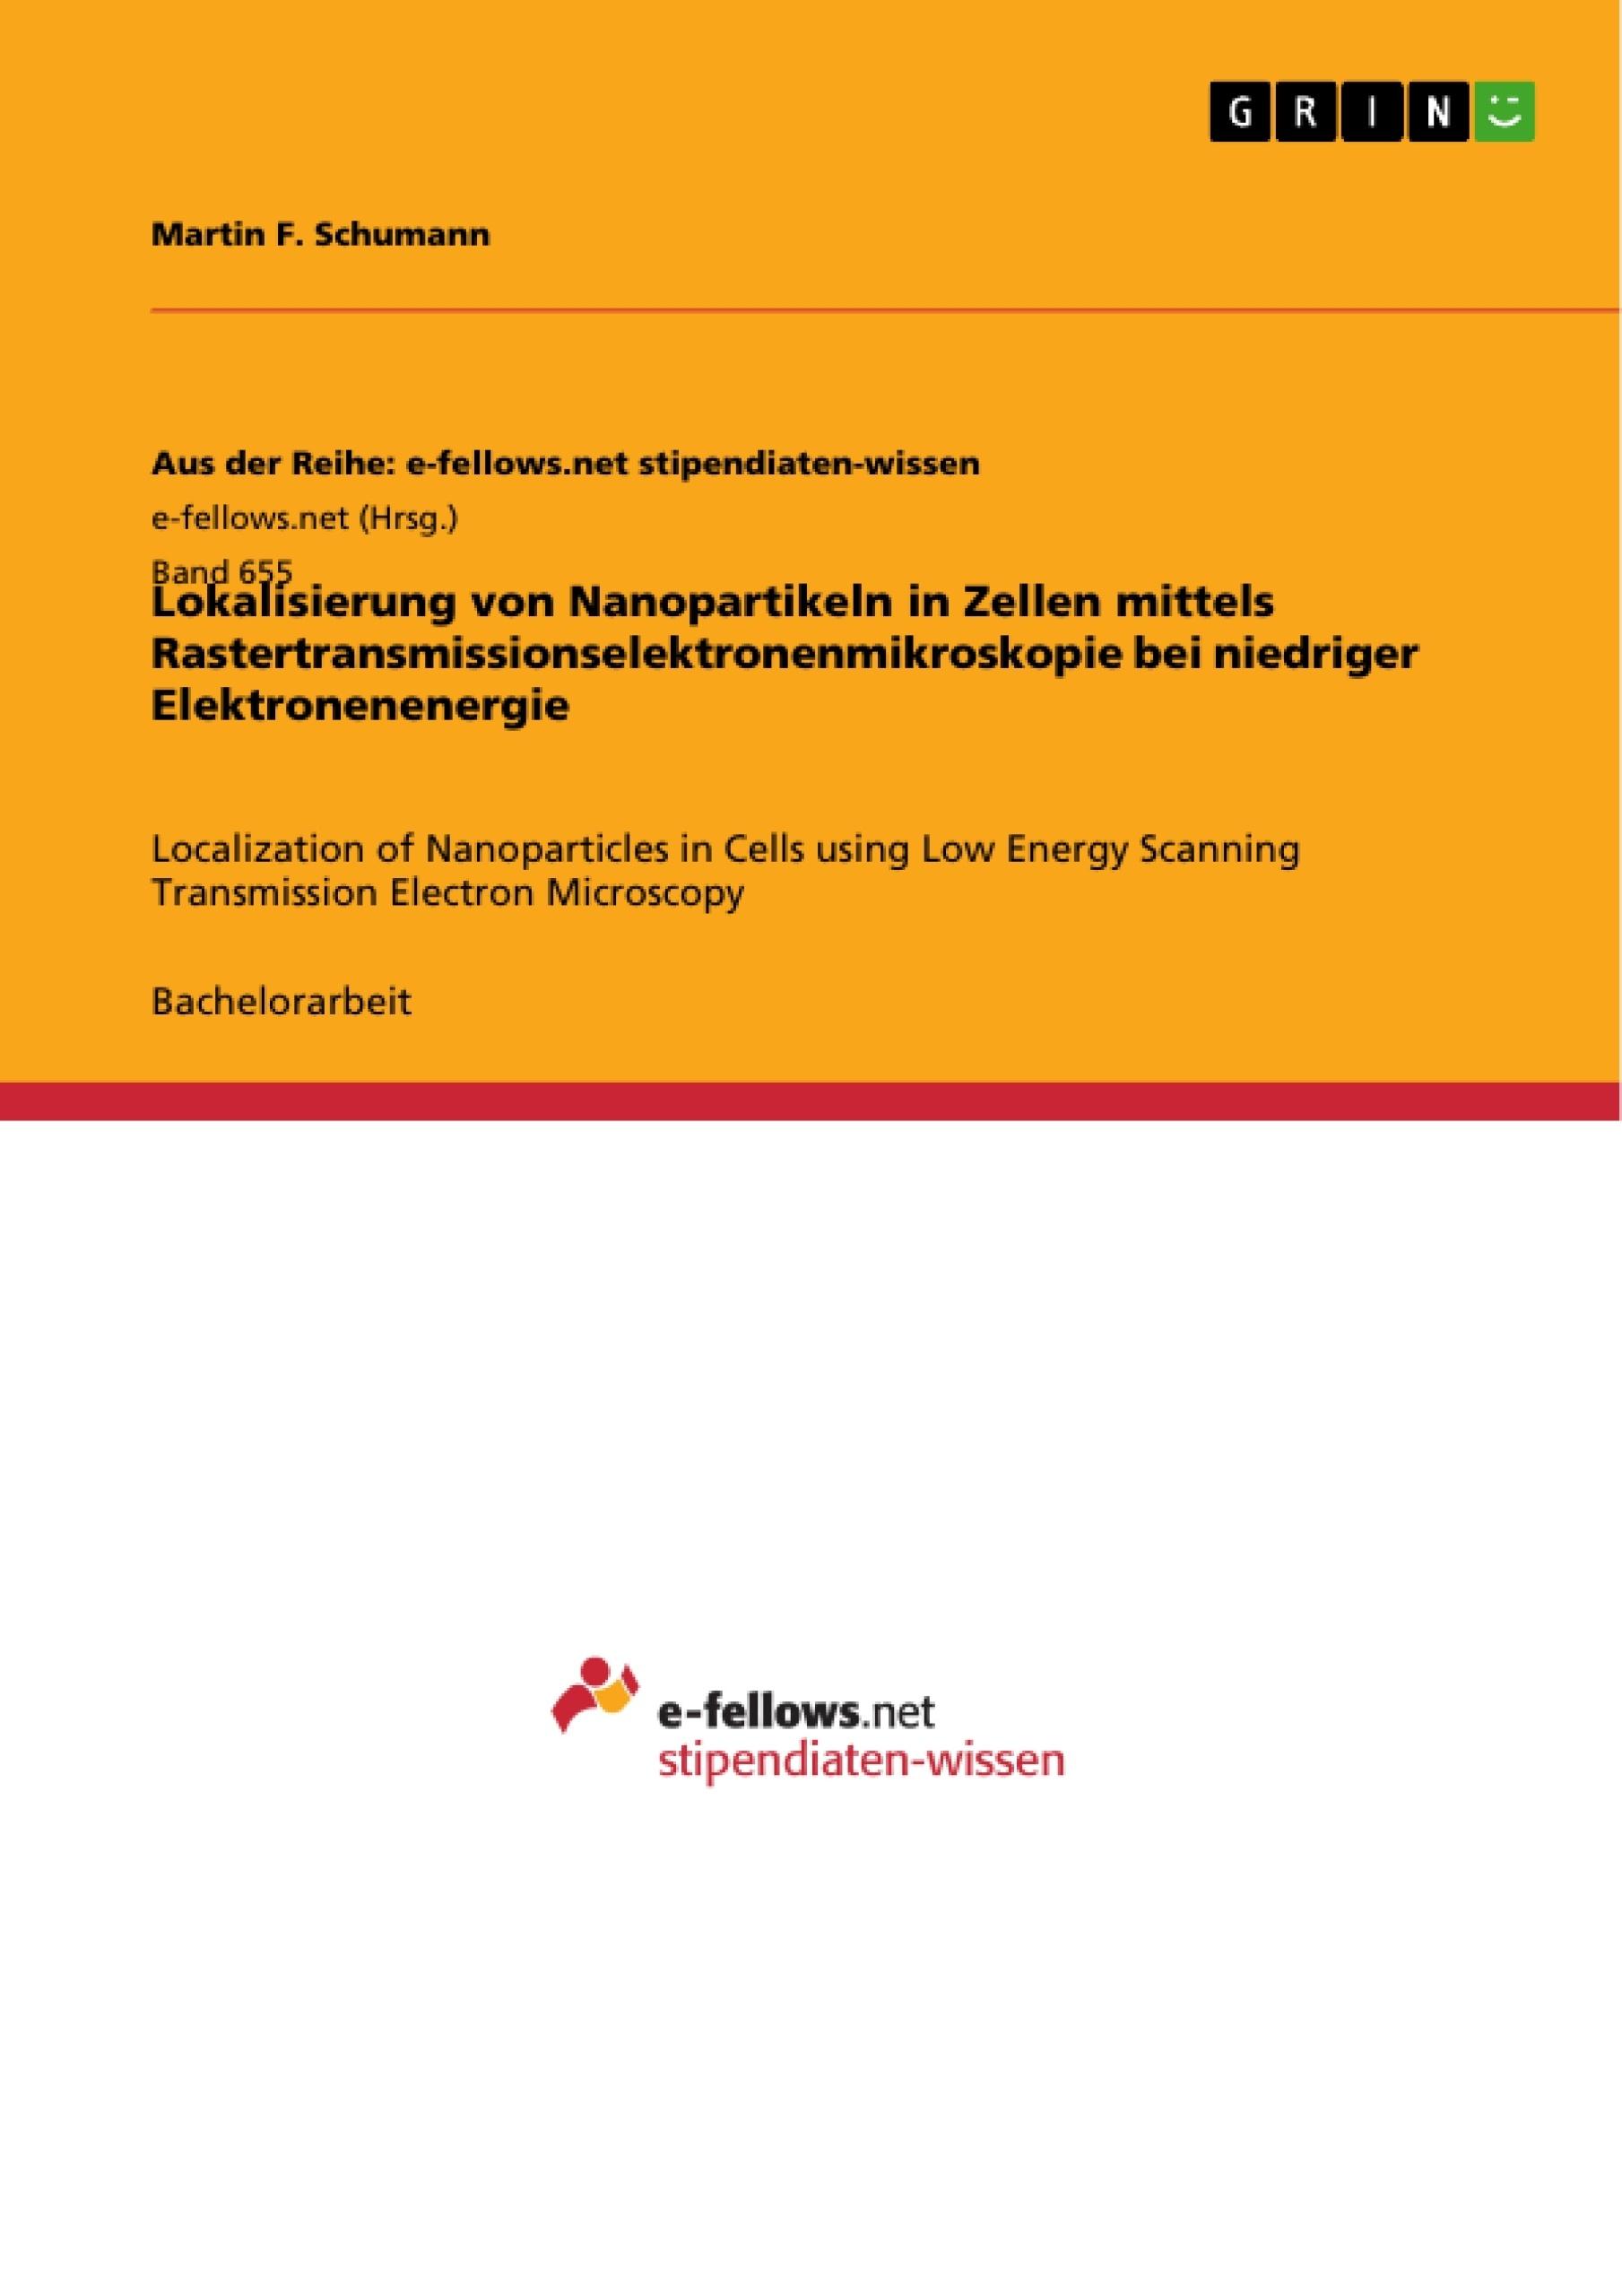 Titel: Lokalisierung von Nanopartikeln in Zellen mittels Rastertransmissionselektronenmikroskopie bei niedriger Elektronenenergie